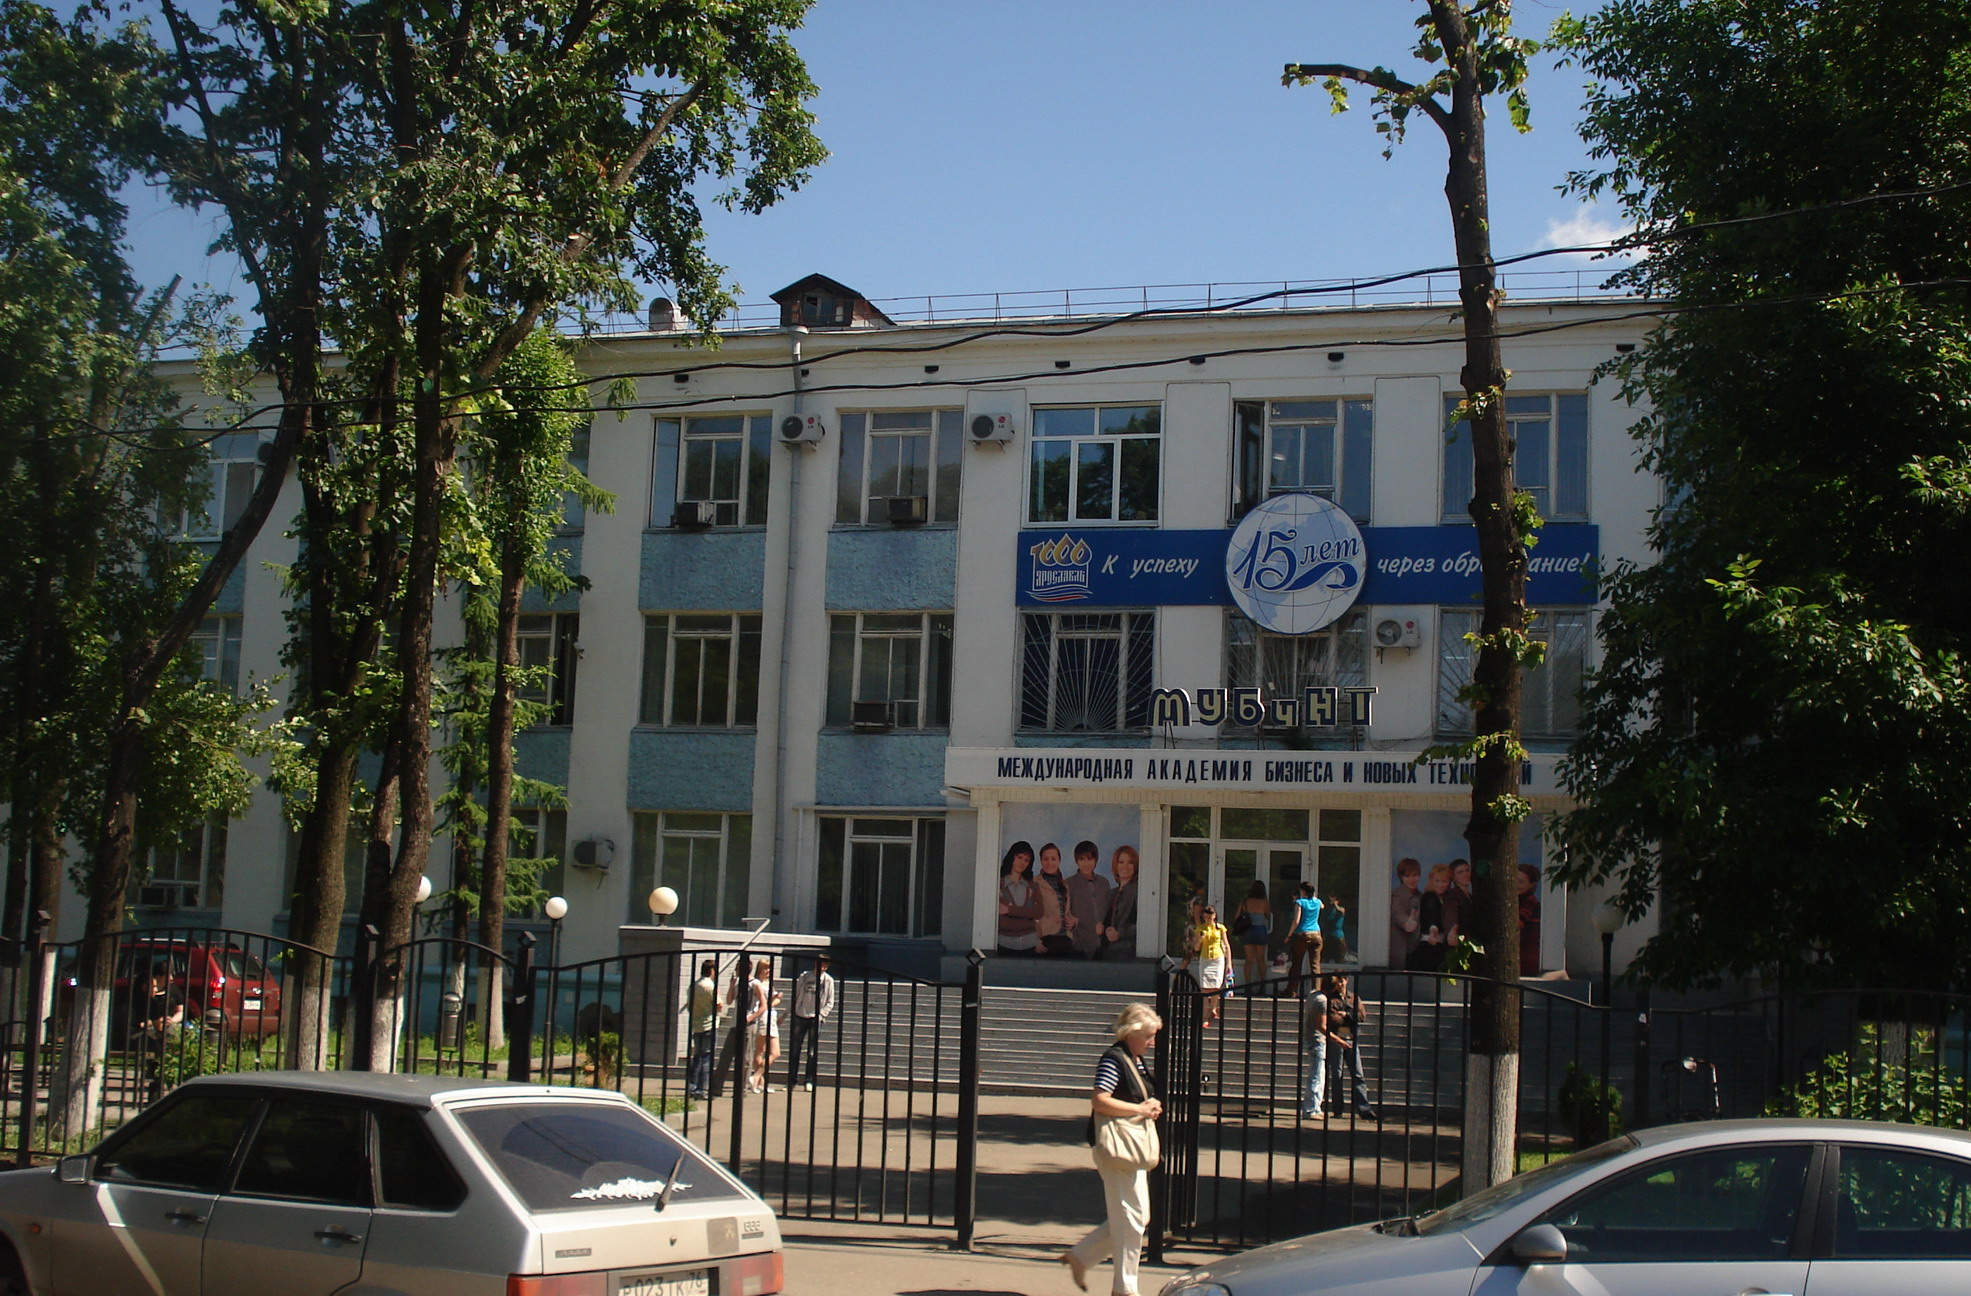 Анаем татарский сайт знакомств соединяя татар 3